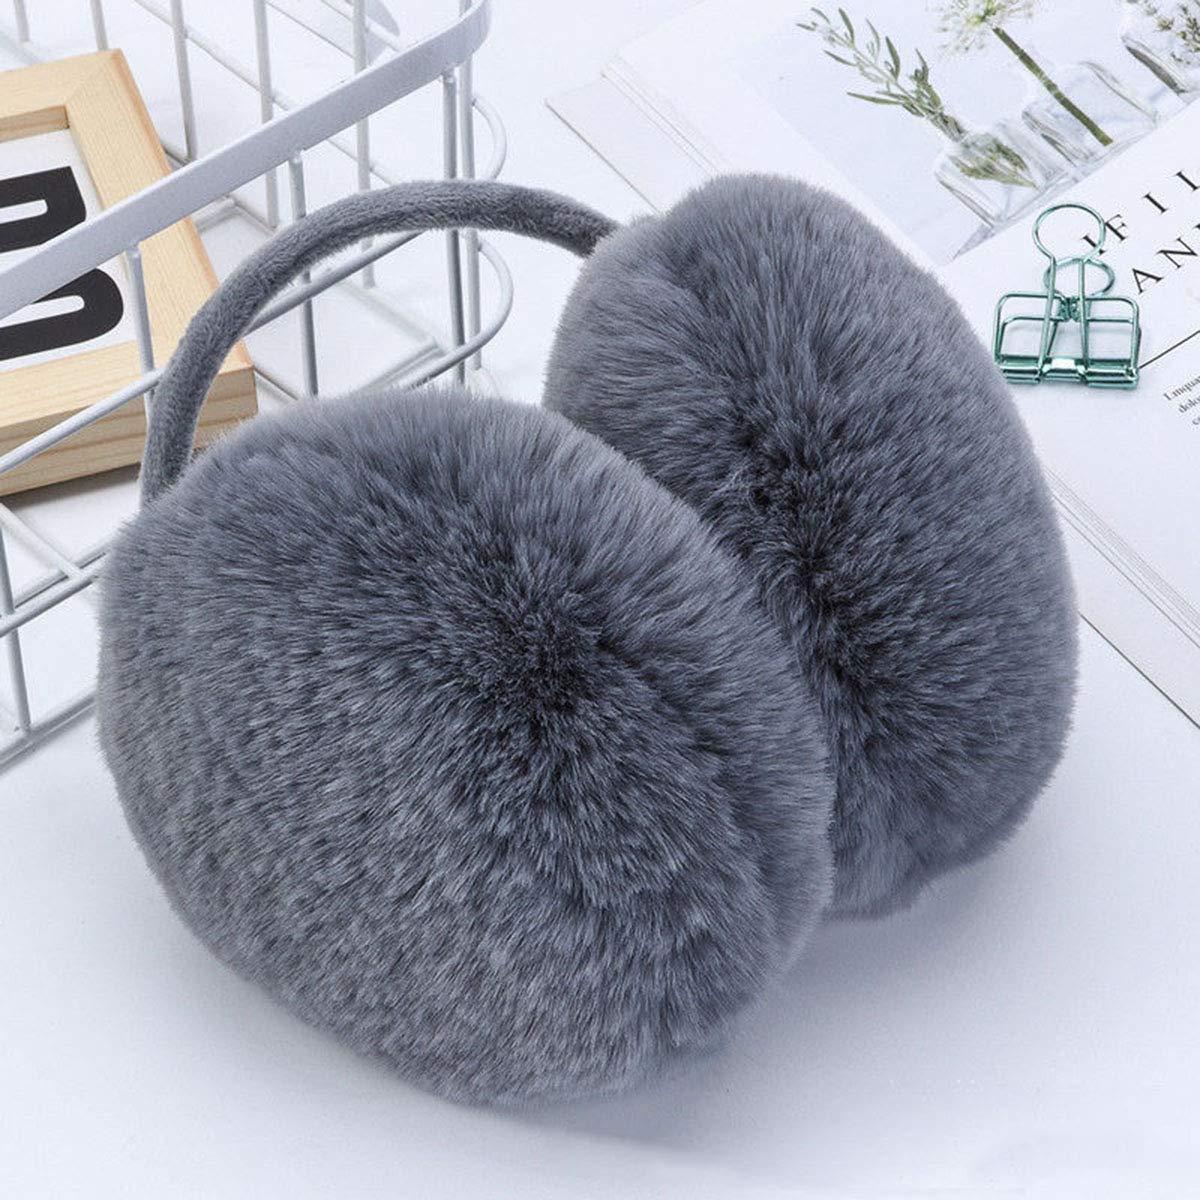 Mens//Womens//Girls Winter Faux Fur Ear Warmers Outdoors Earmuffs Behind the Head